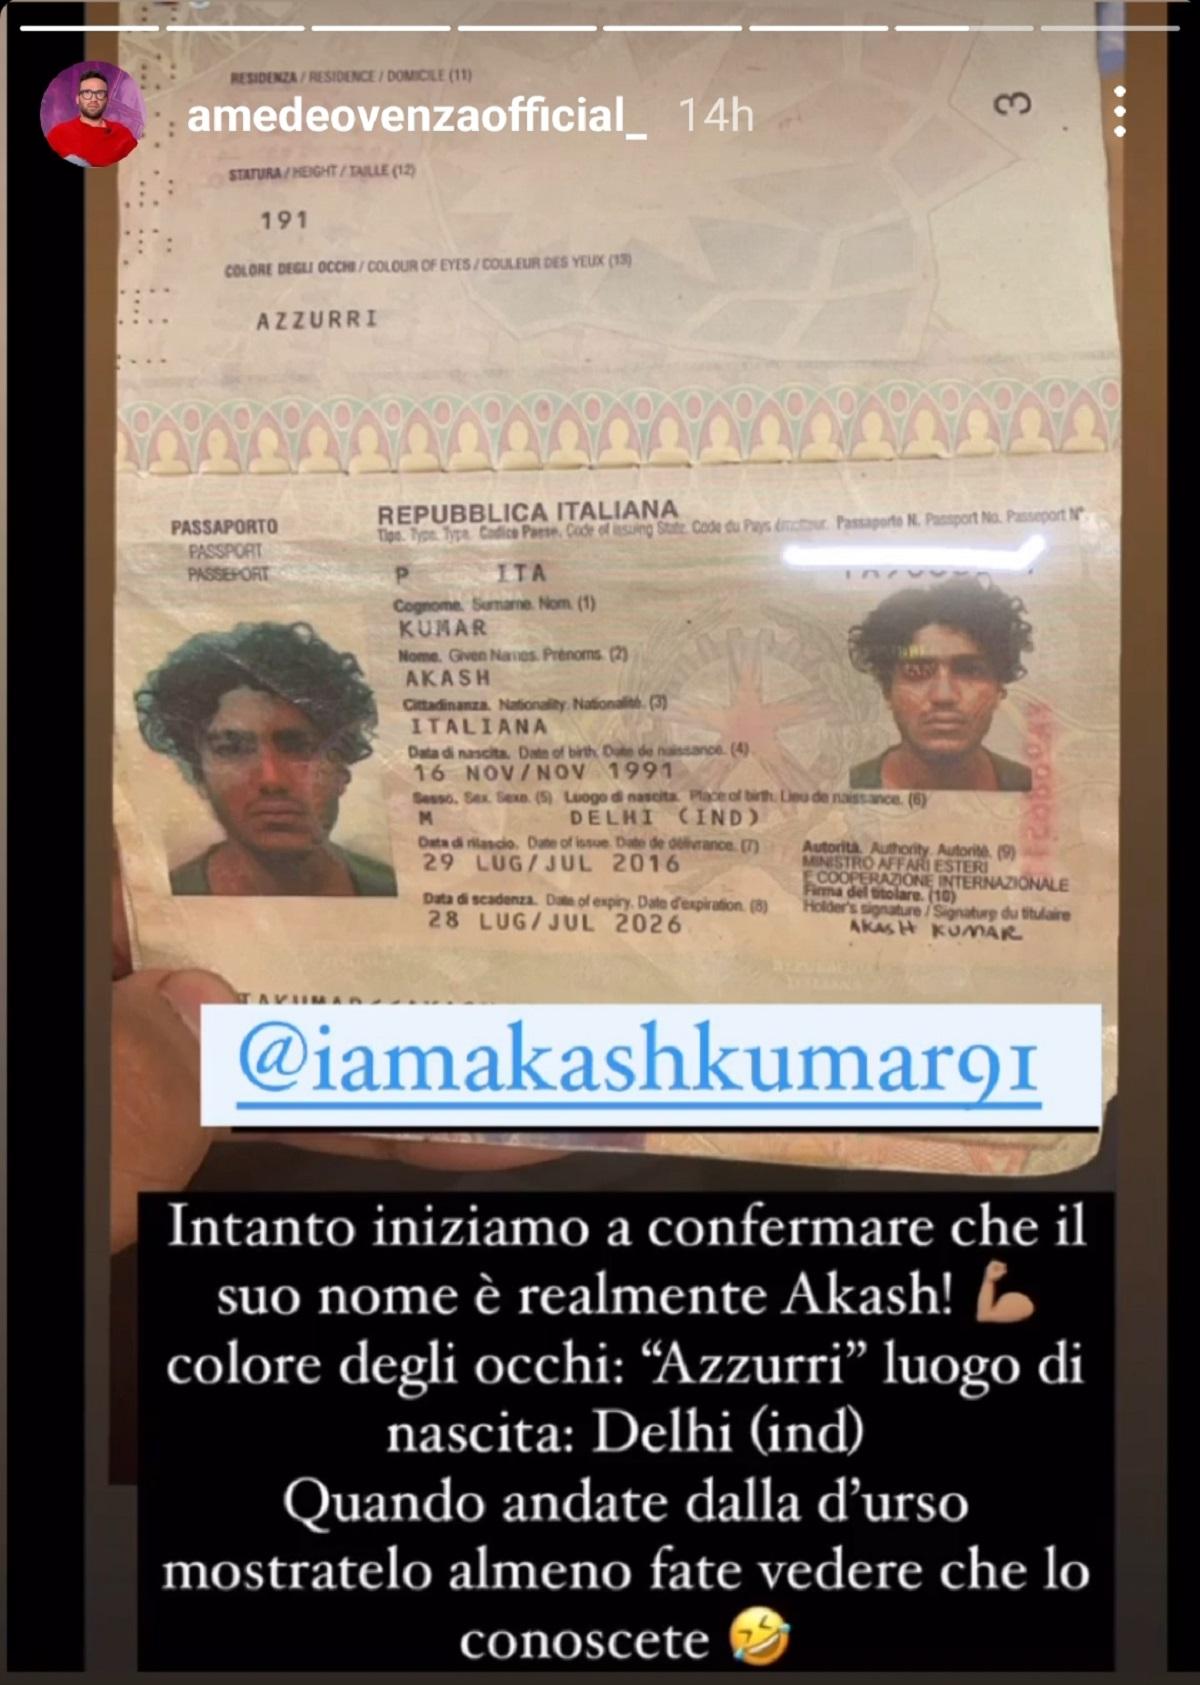 akash kumar passaporto